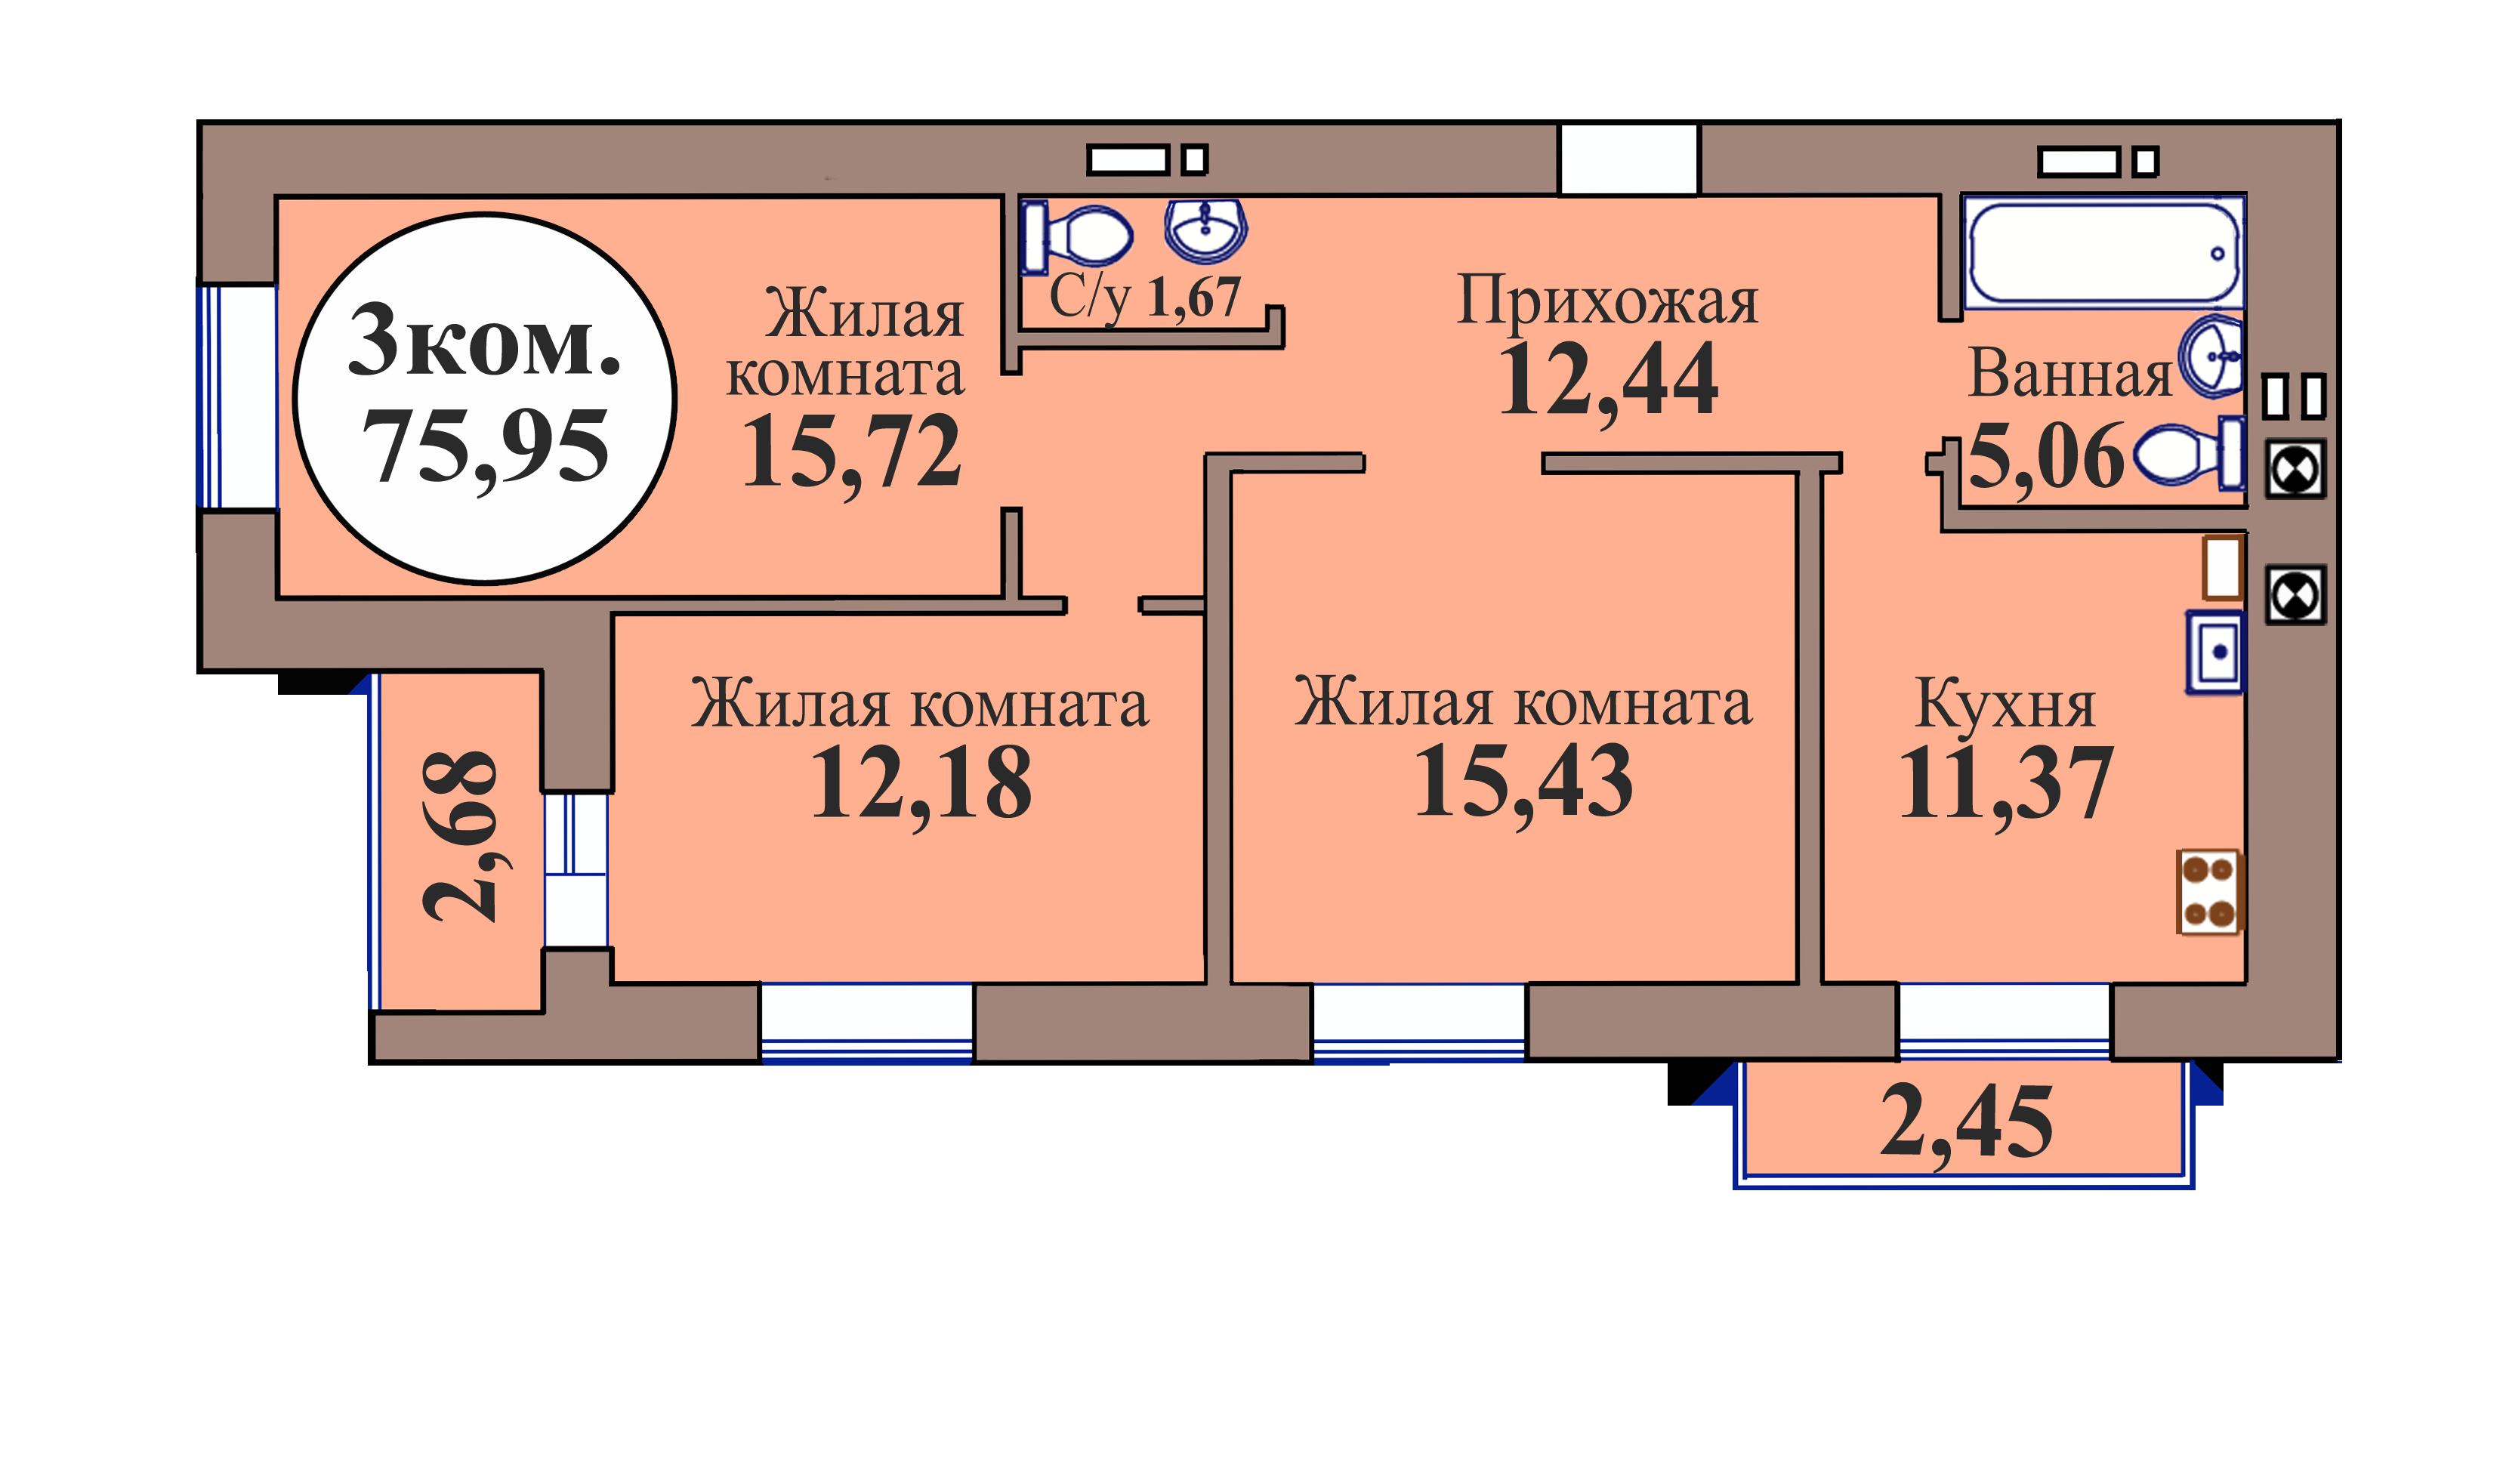 3-комн. кв. по пер. Калининградский, 5 кв. 230 в Калининграде